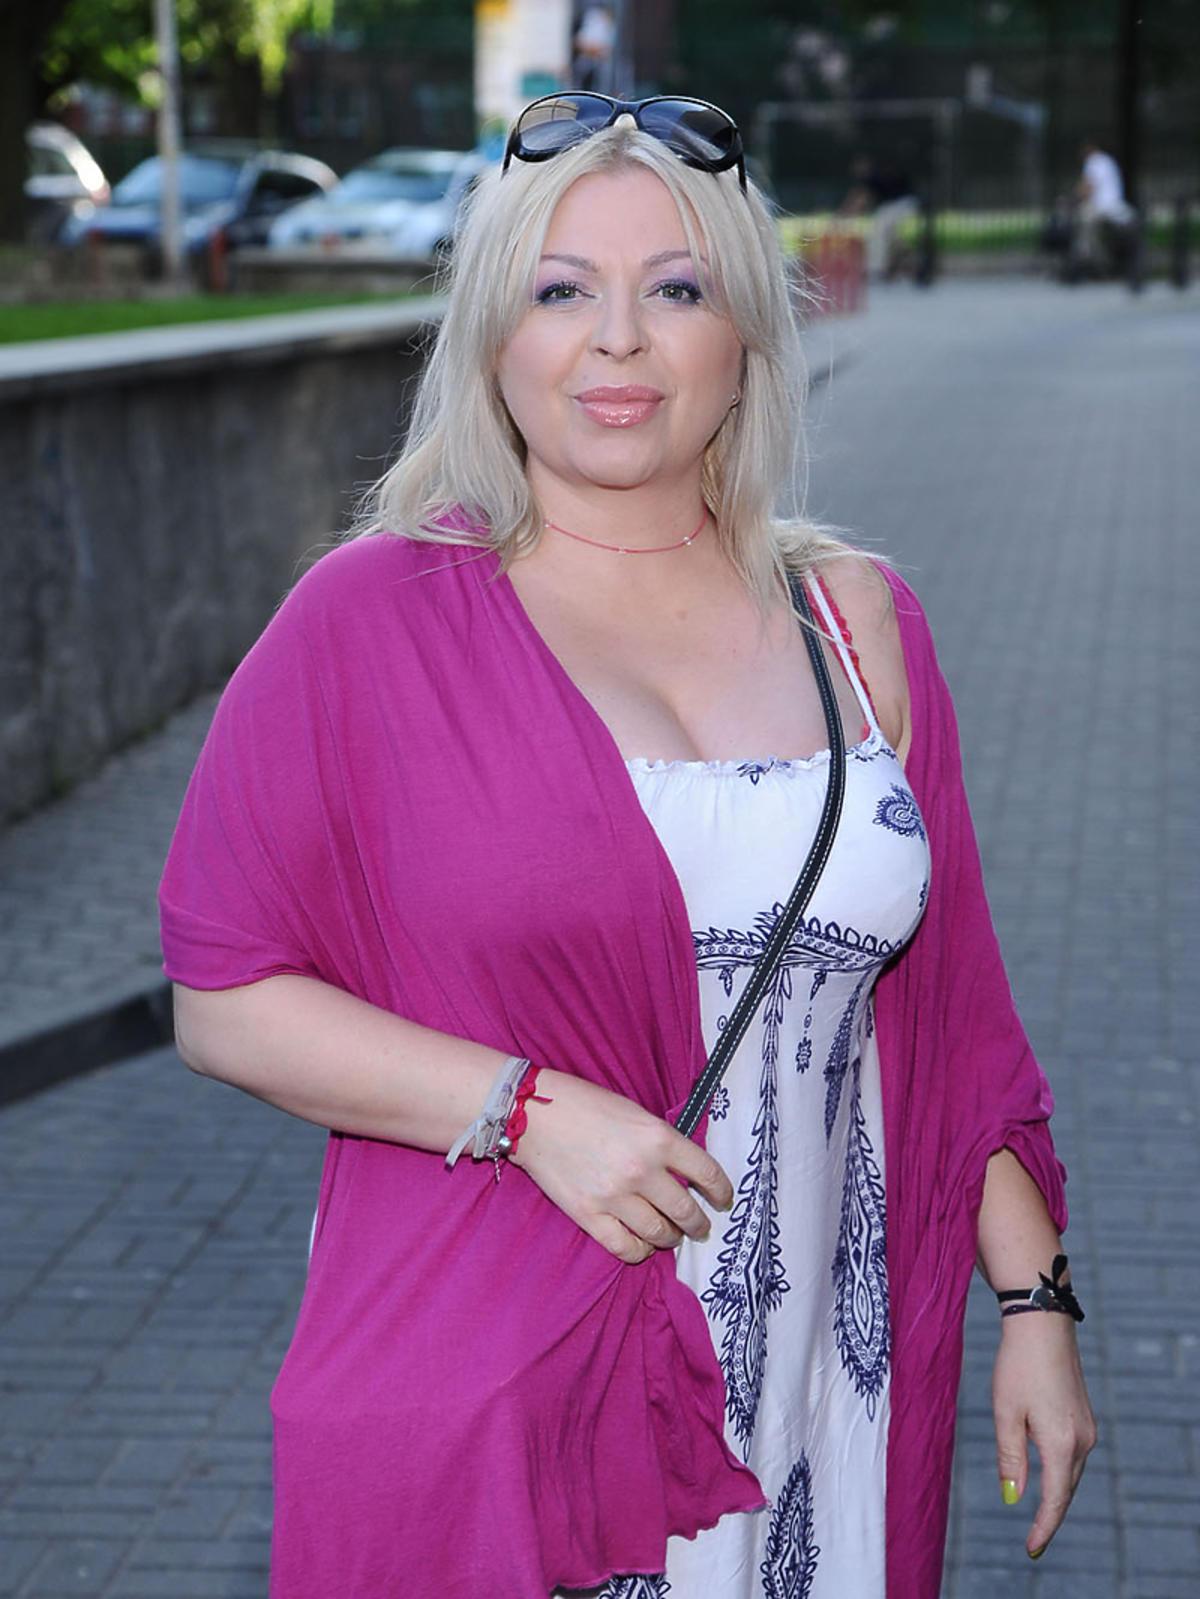 Violetta Arlak z